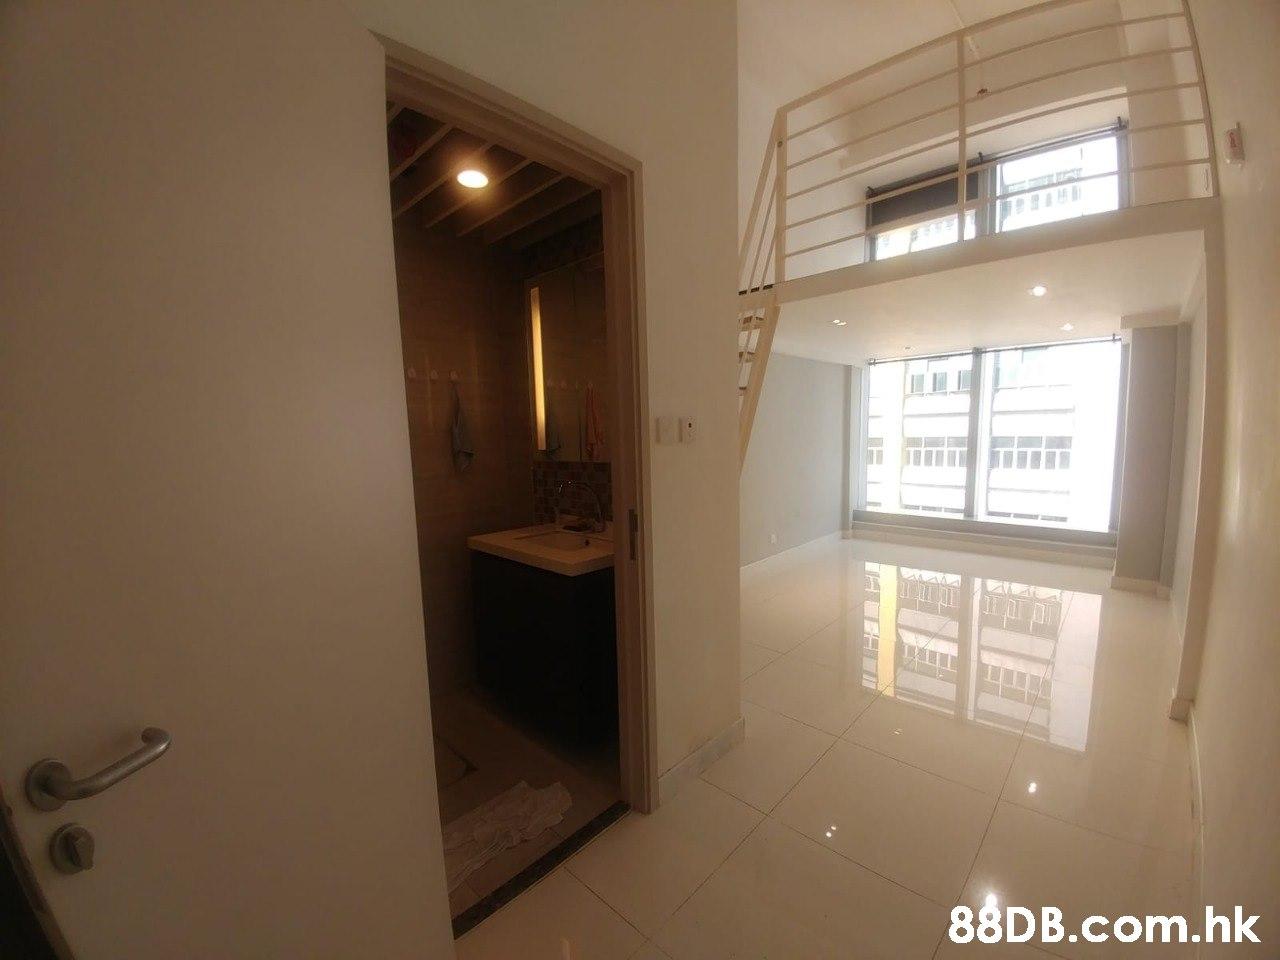 .hk  Property,Room,Building,Real estate,Floor